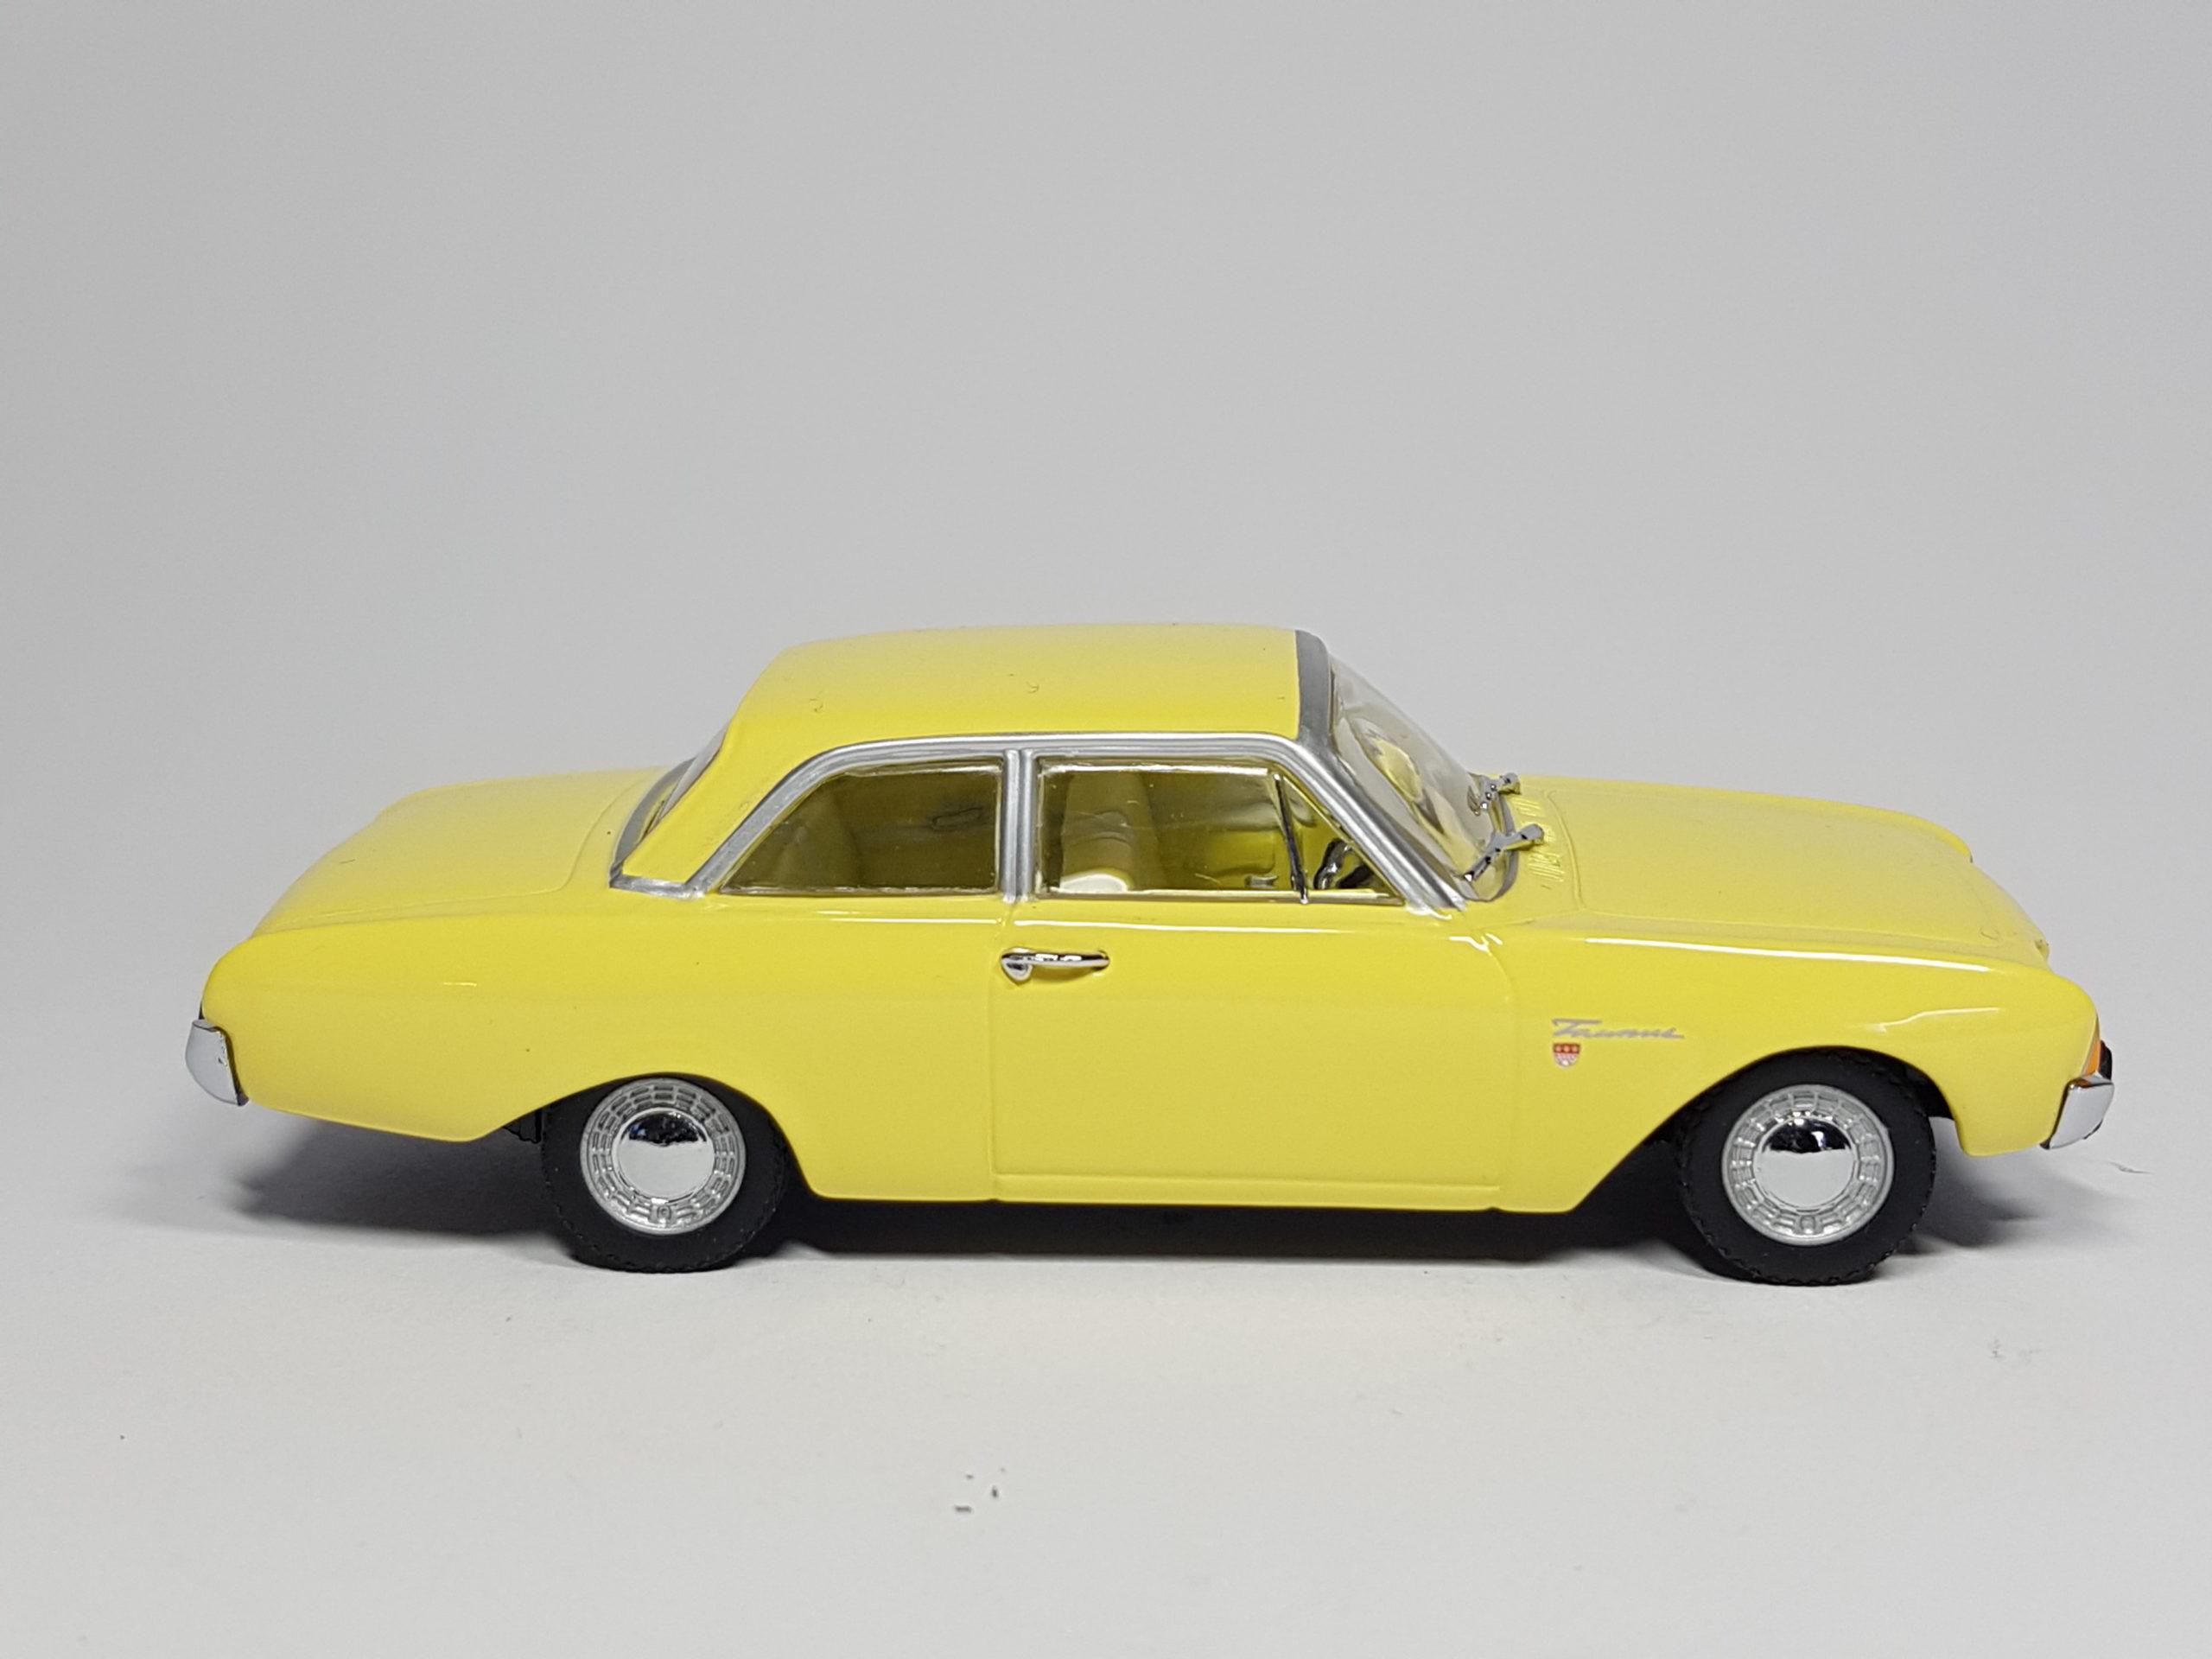 Ford Taunus 17 M saloon P3